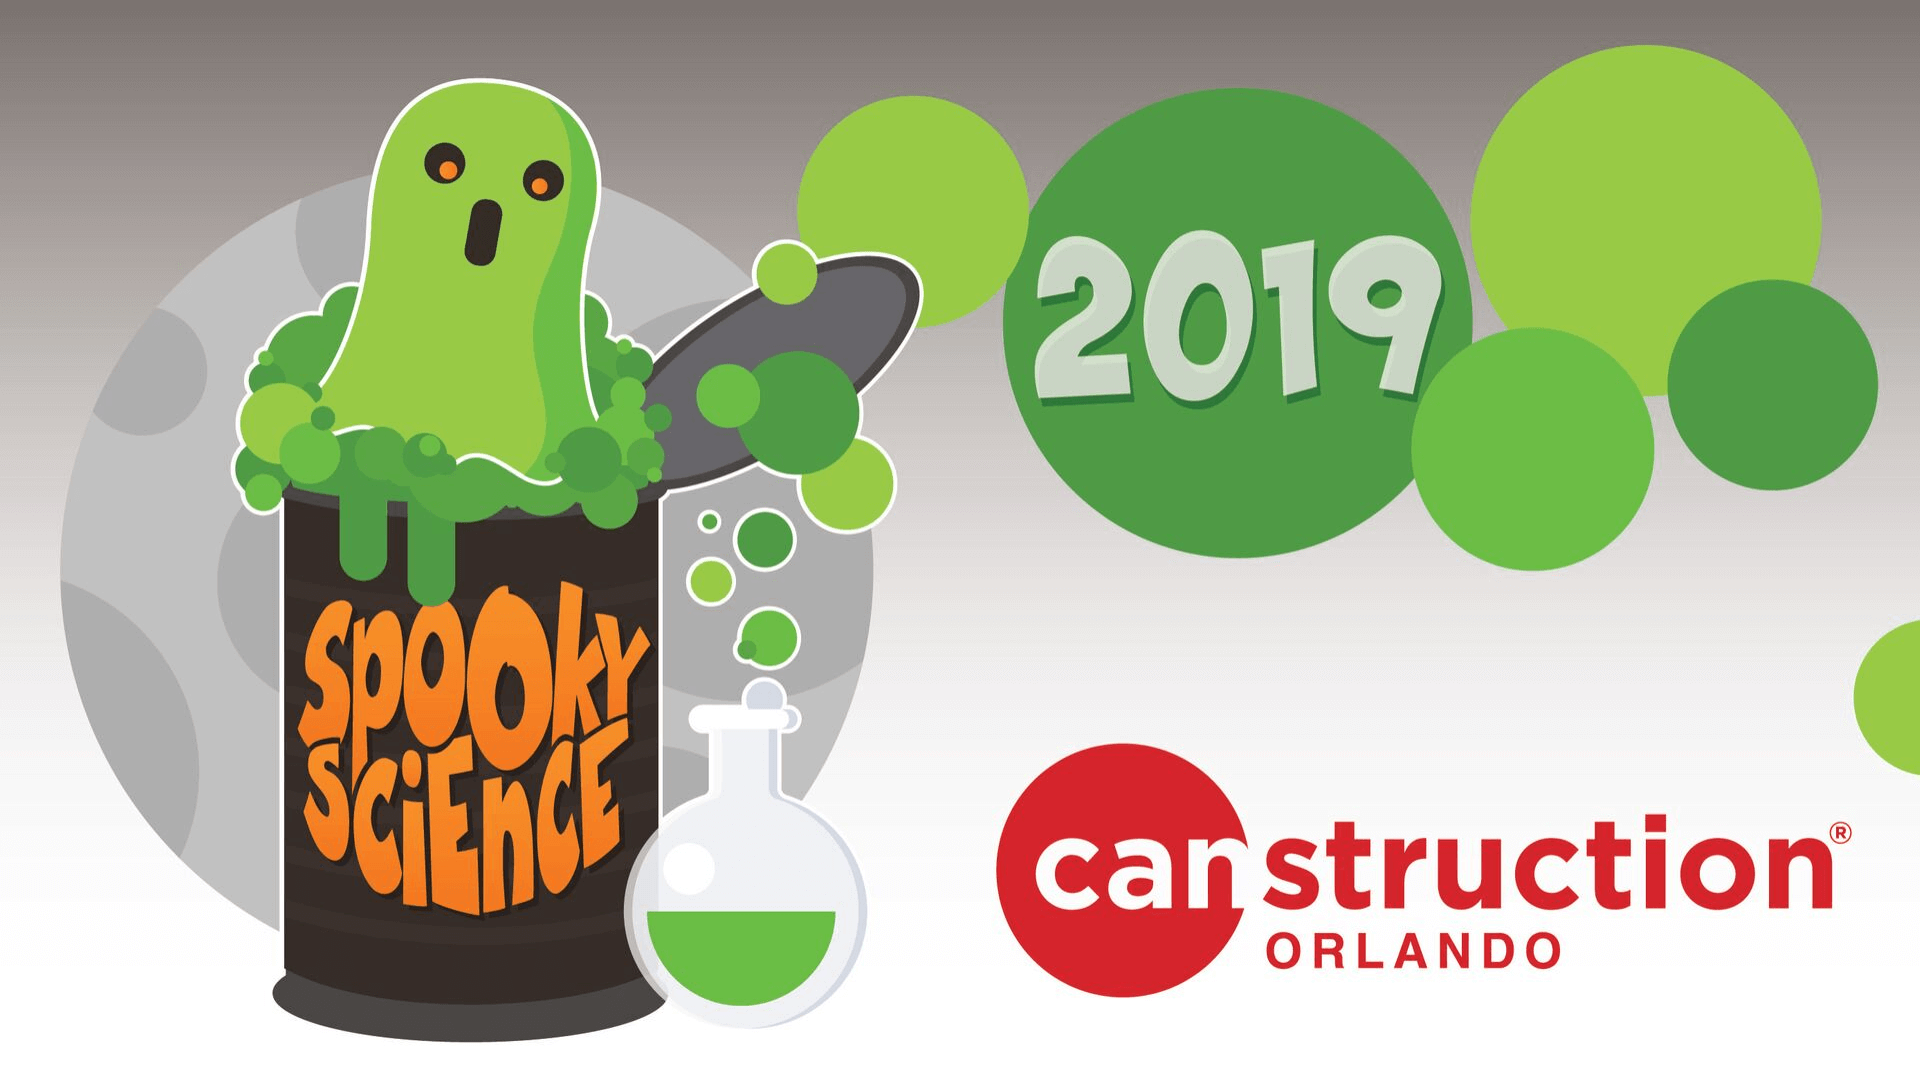 Canstruction Orlando 2019 graphic